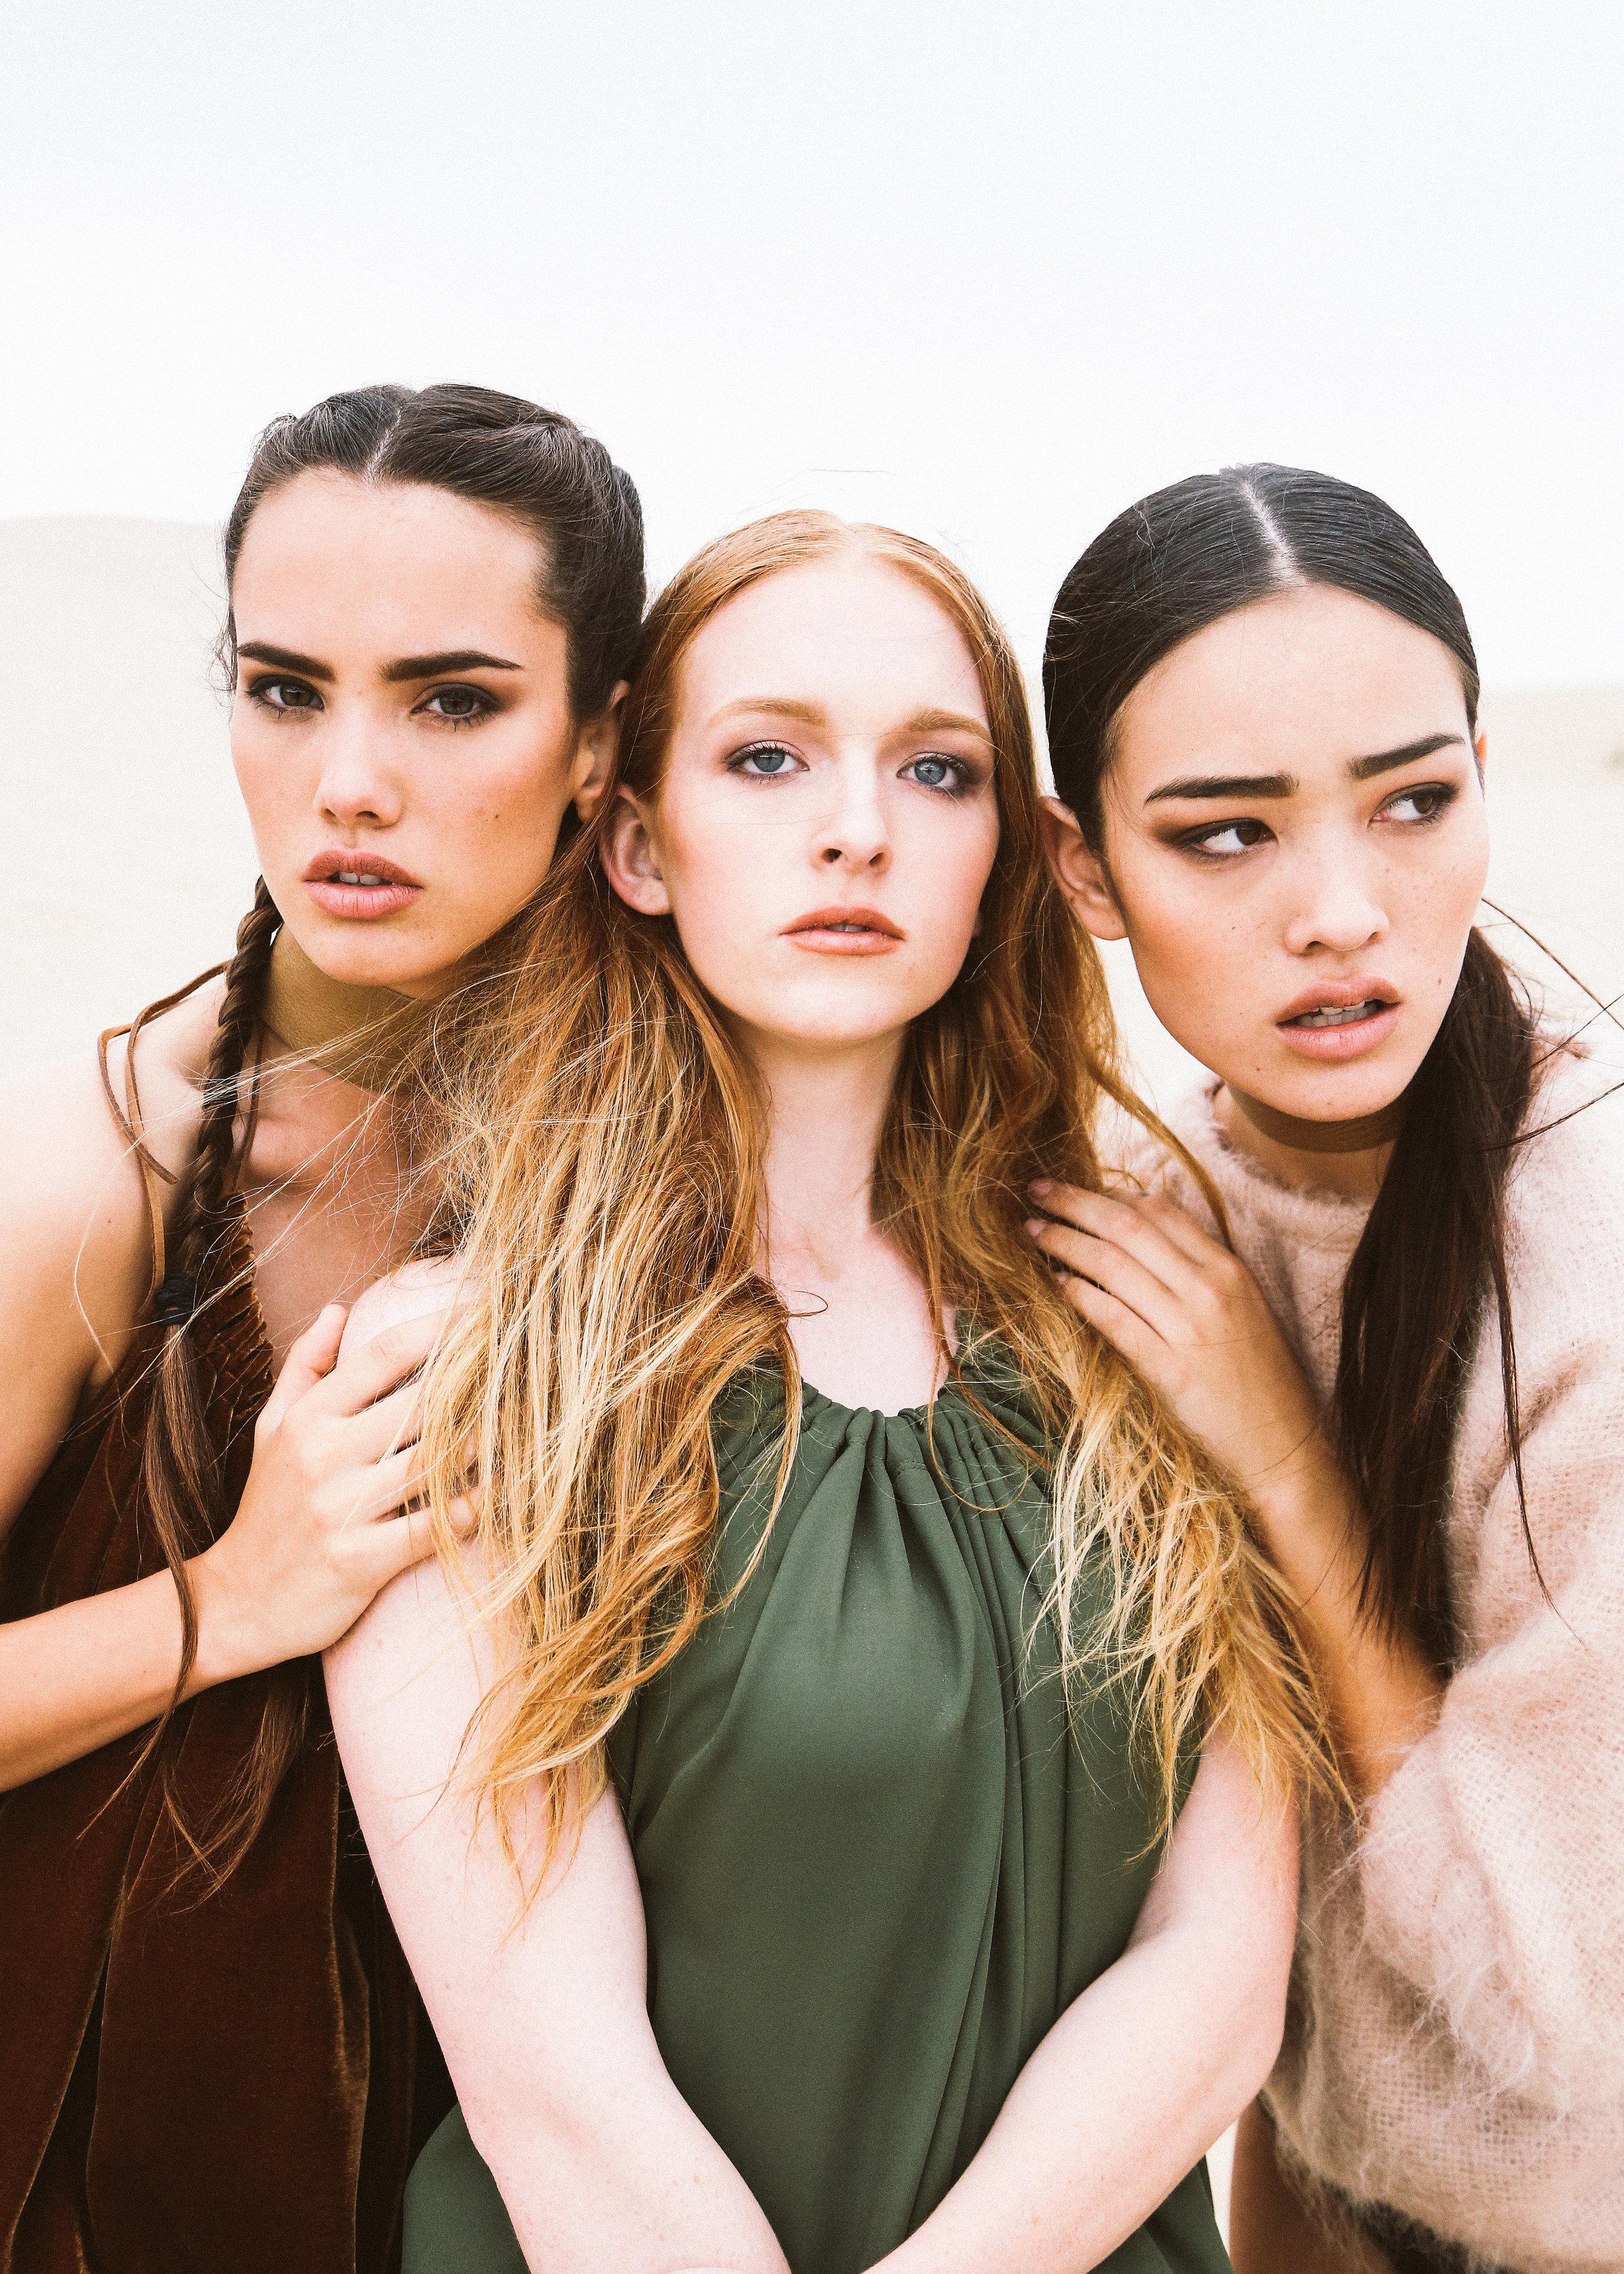 DETAILS  Photography: Evelyn Eslava  Makeup: Chelsea Vuksinick  Wardrobe: Melody Noy  Models (left to right): Tiffany Pliler ,Camille Nicole, Elizabeth Wood  Styling by: Megan Beckham